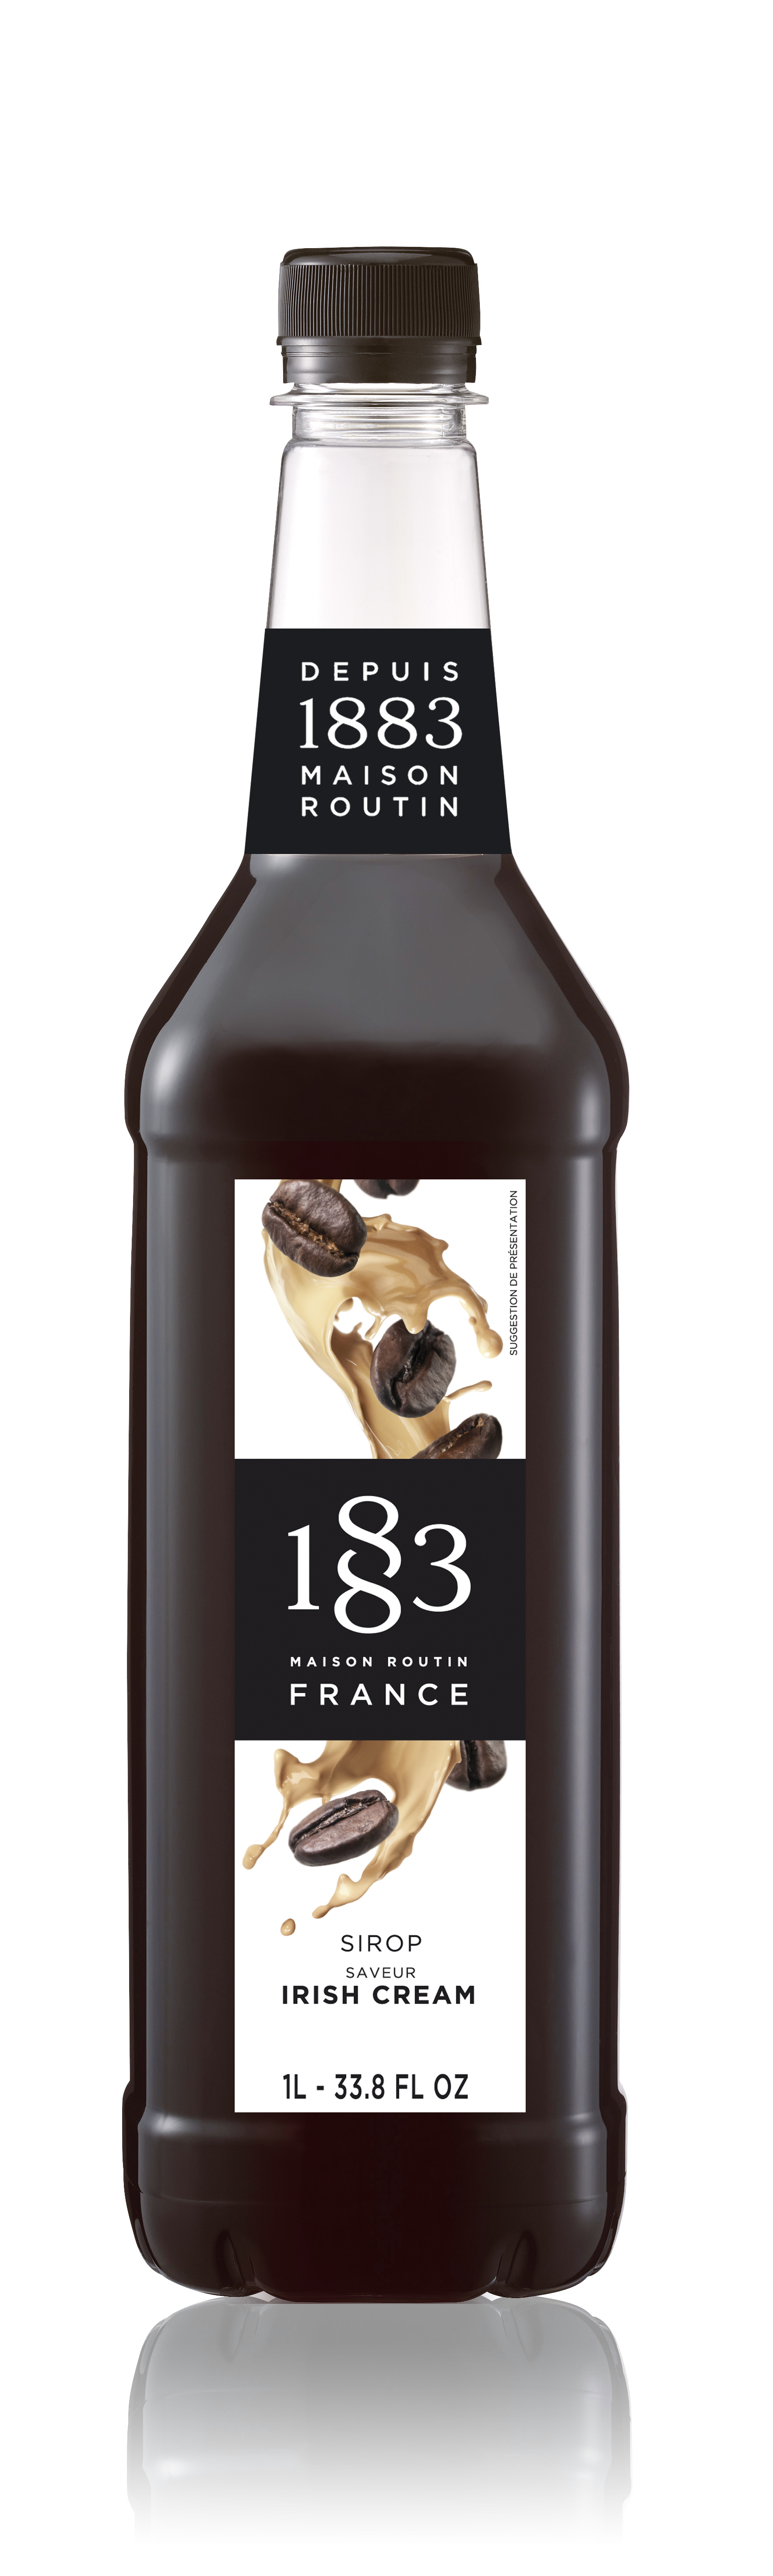 1883 Syrup Irish Cream 1L PET Plastic Bottle